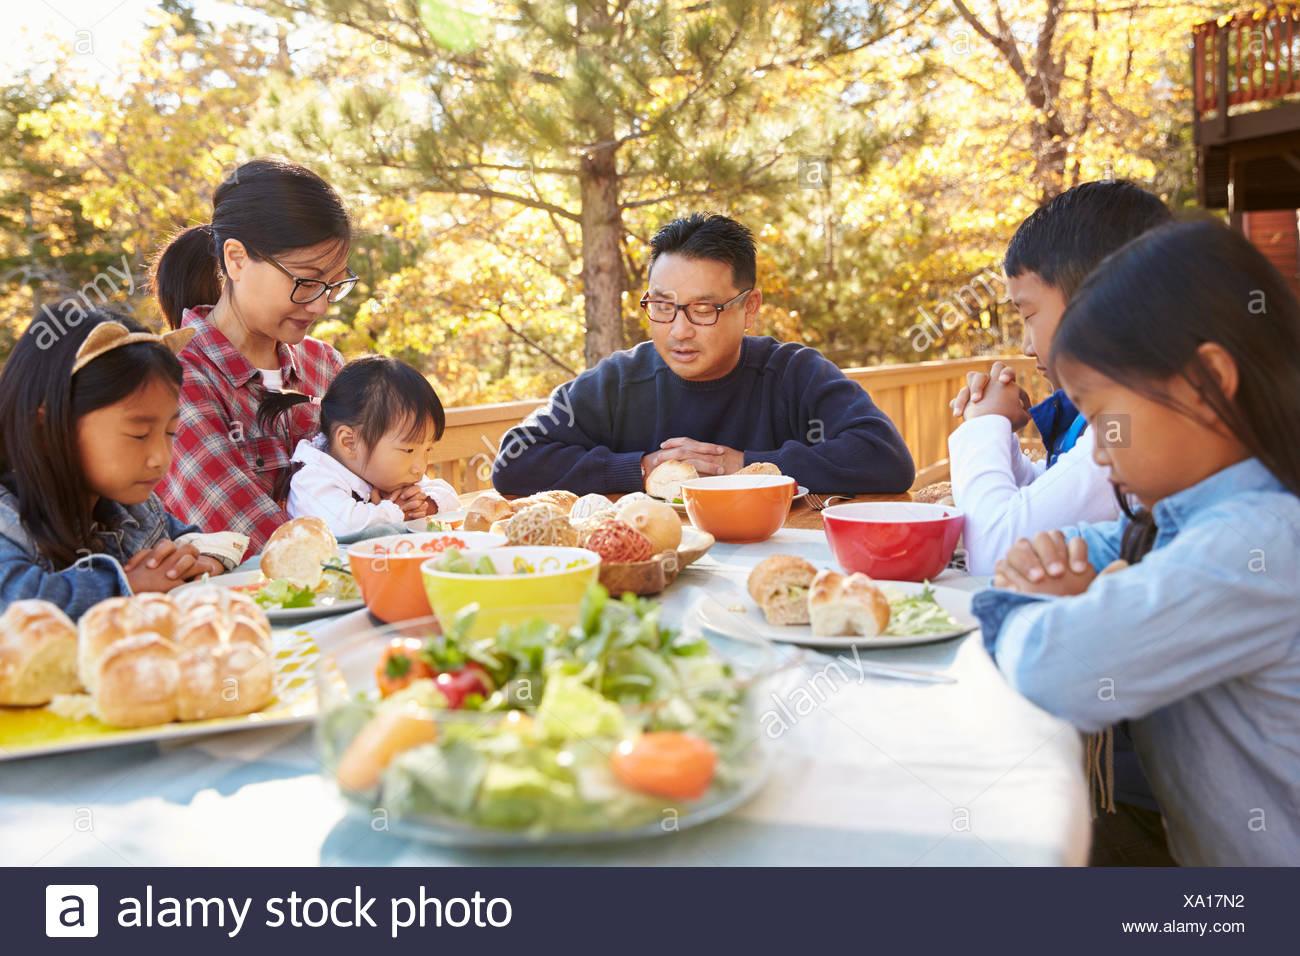 Asian prayer eating images 623